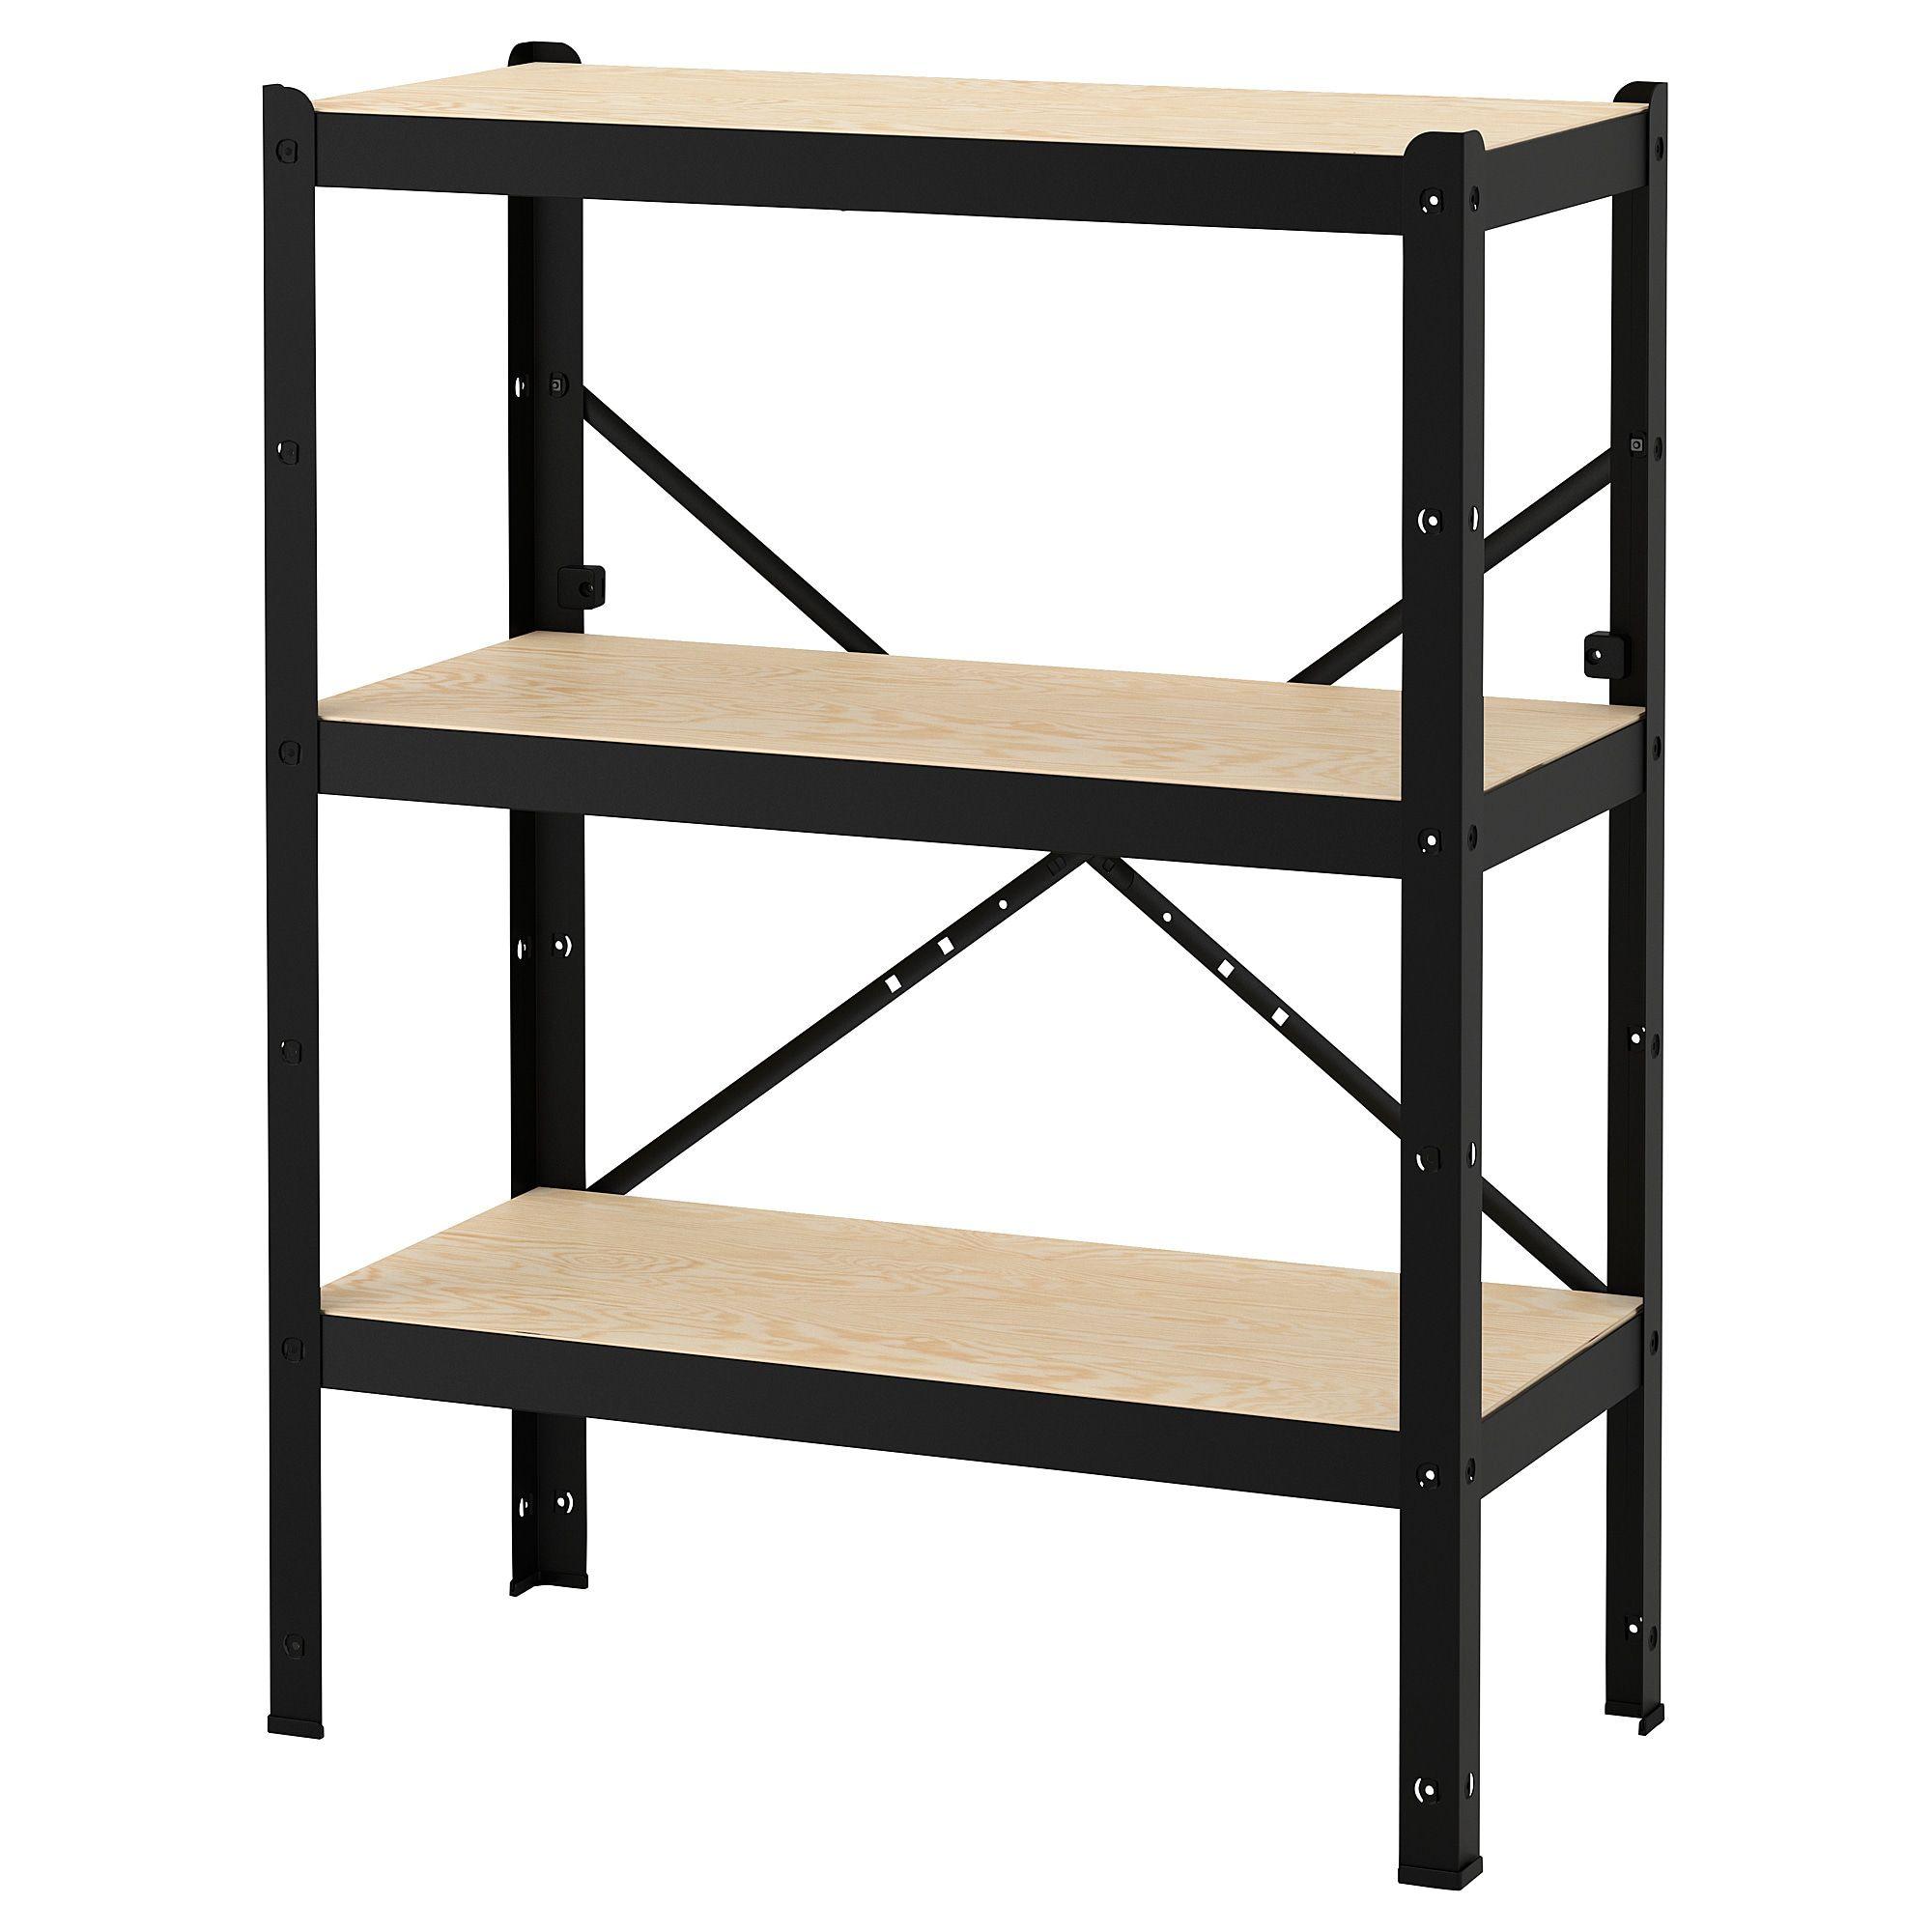 Bror Etagere Noir Bois 85x40x110 Cm Ikea In 2020 Shelving Unit Shelving Wood Shelving Units